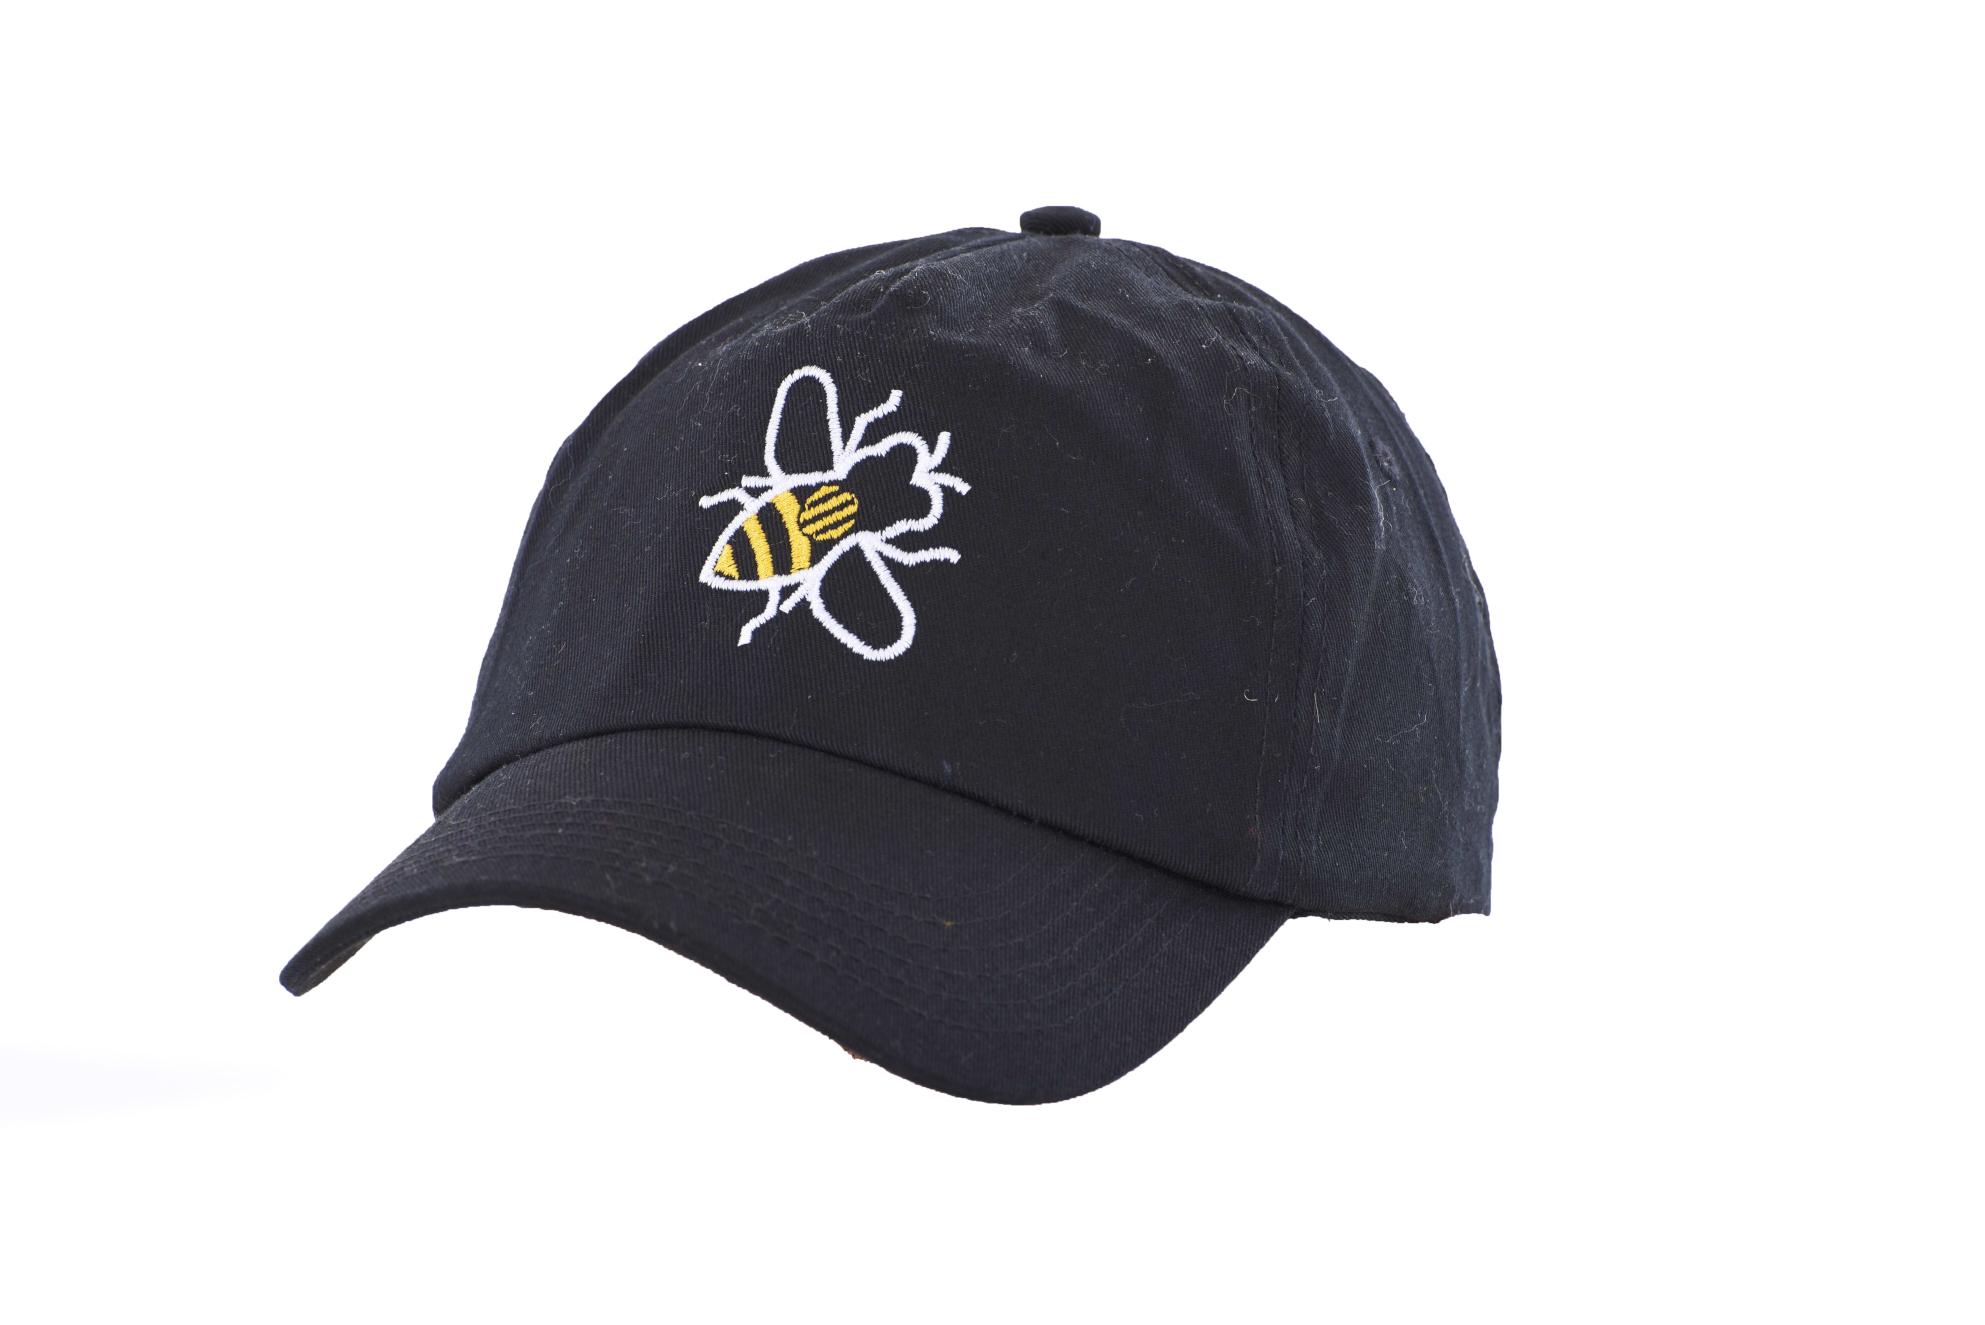 a1bf0d8ae794c9 Black Baseball Cap Simply Bee - Manchester Souvenirs